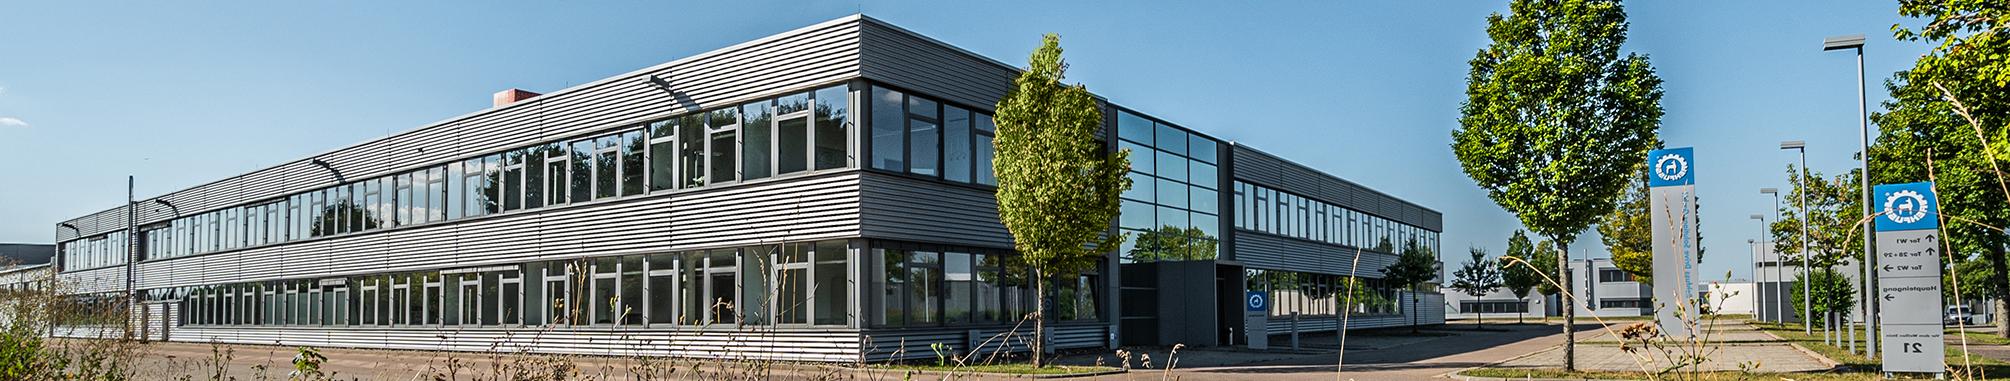 Rehfuss Drive Solutions GmbH